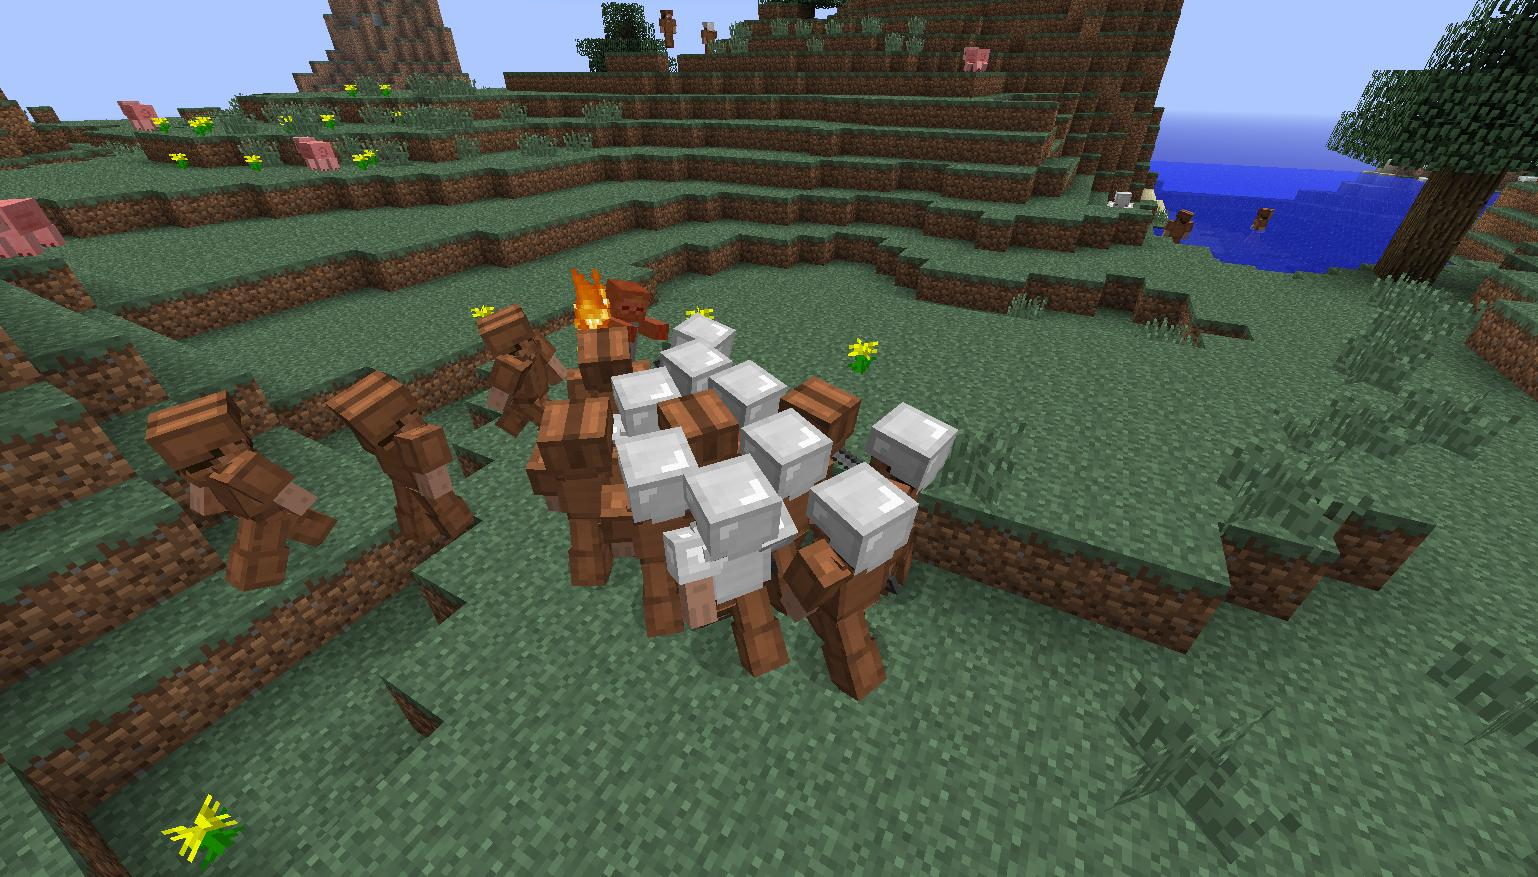 https://img2.9minecraft.net/Mod/Defensive-Villagers-Mod-3.jpg